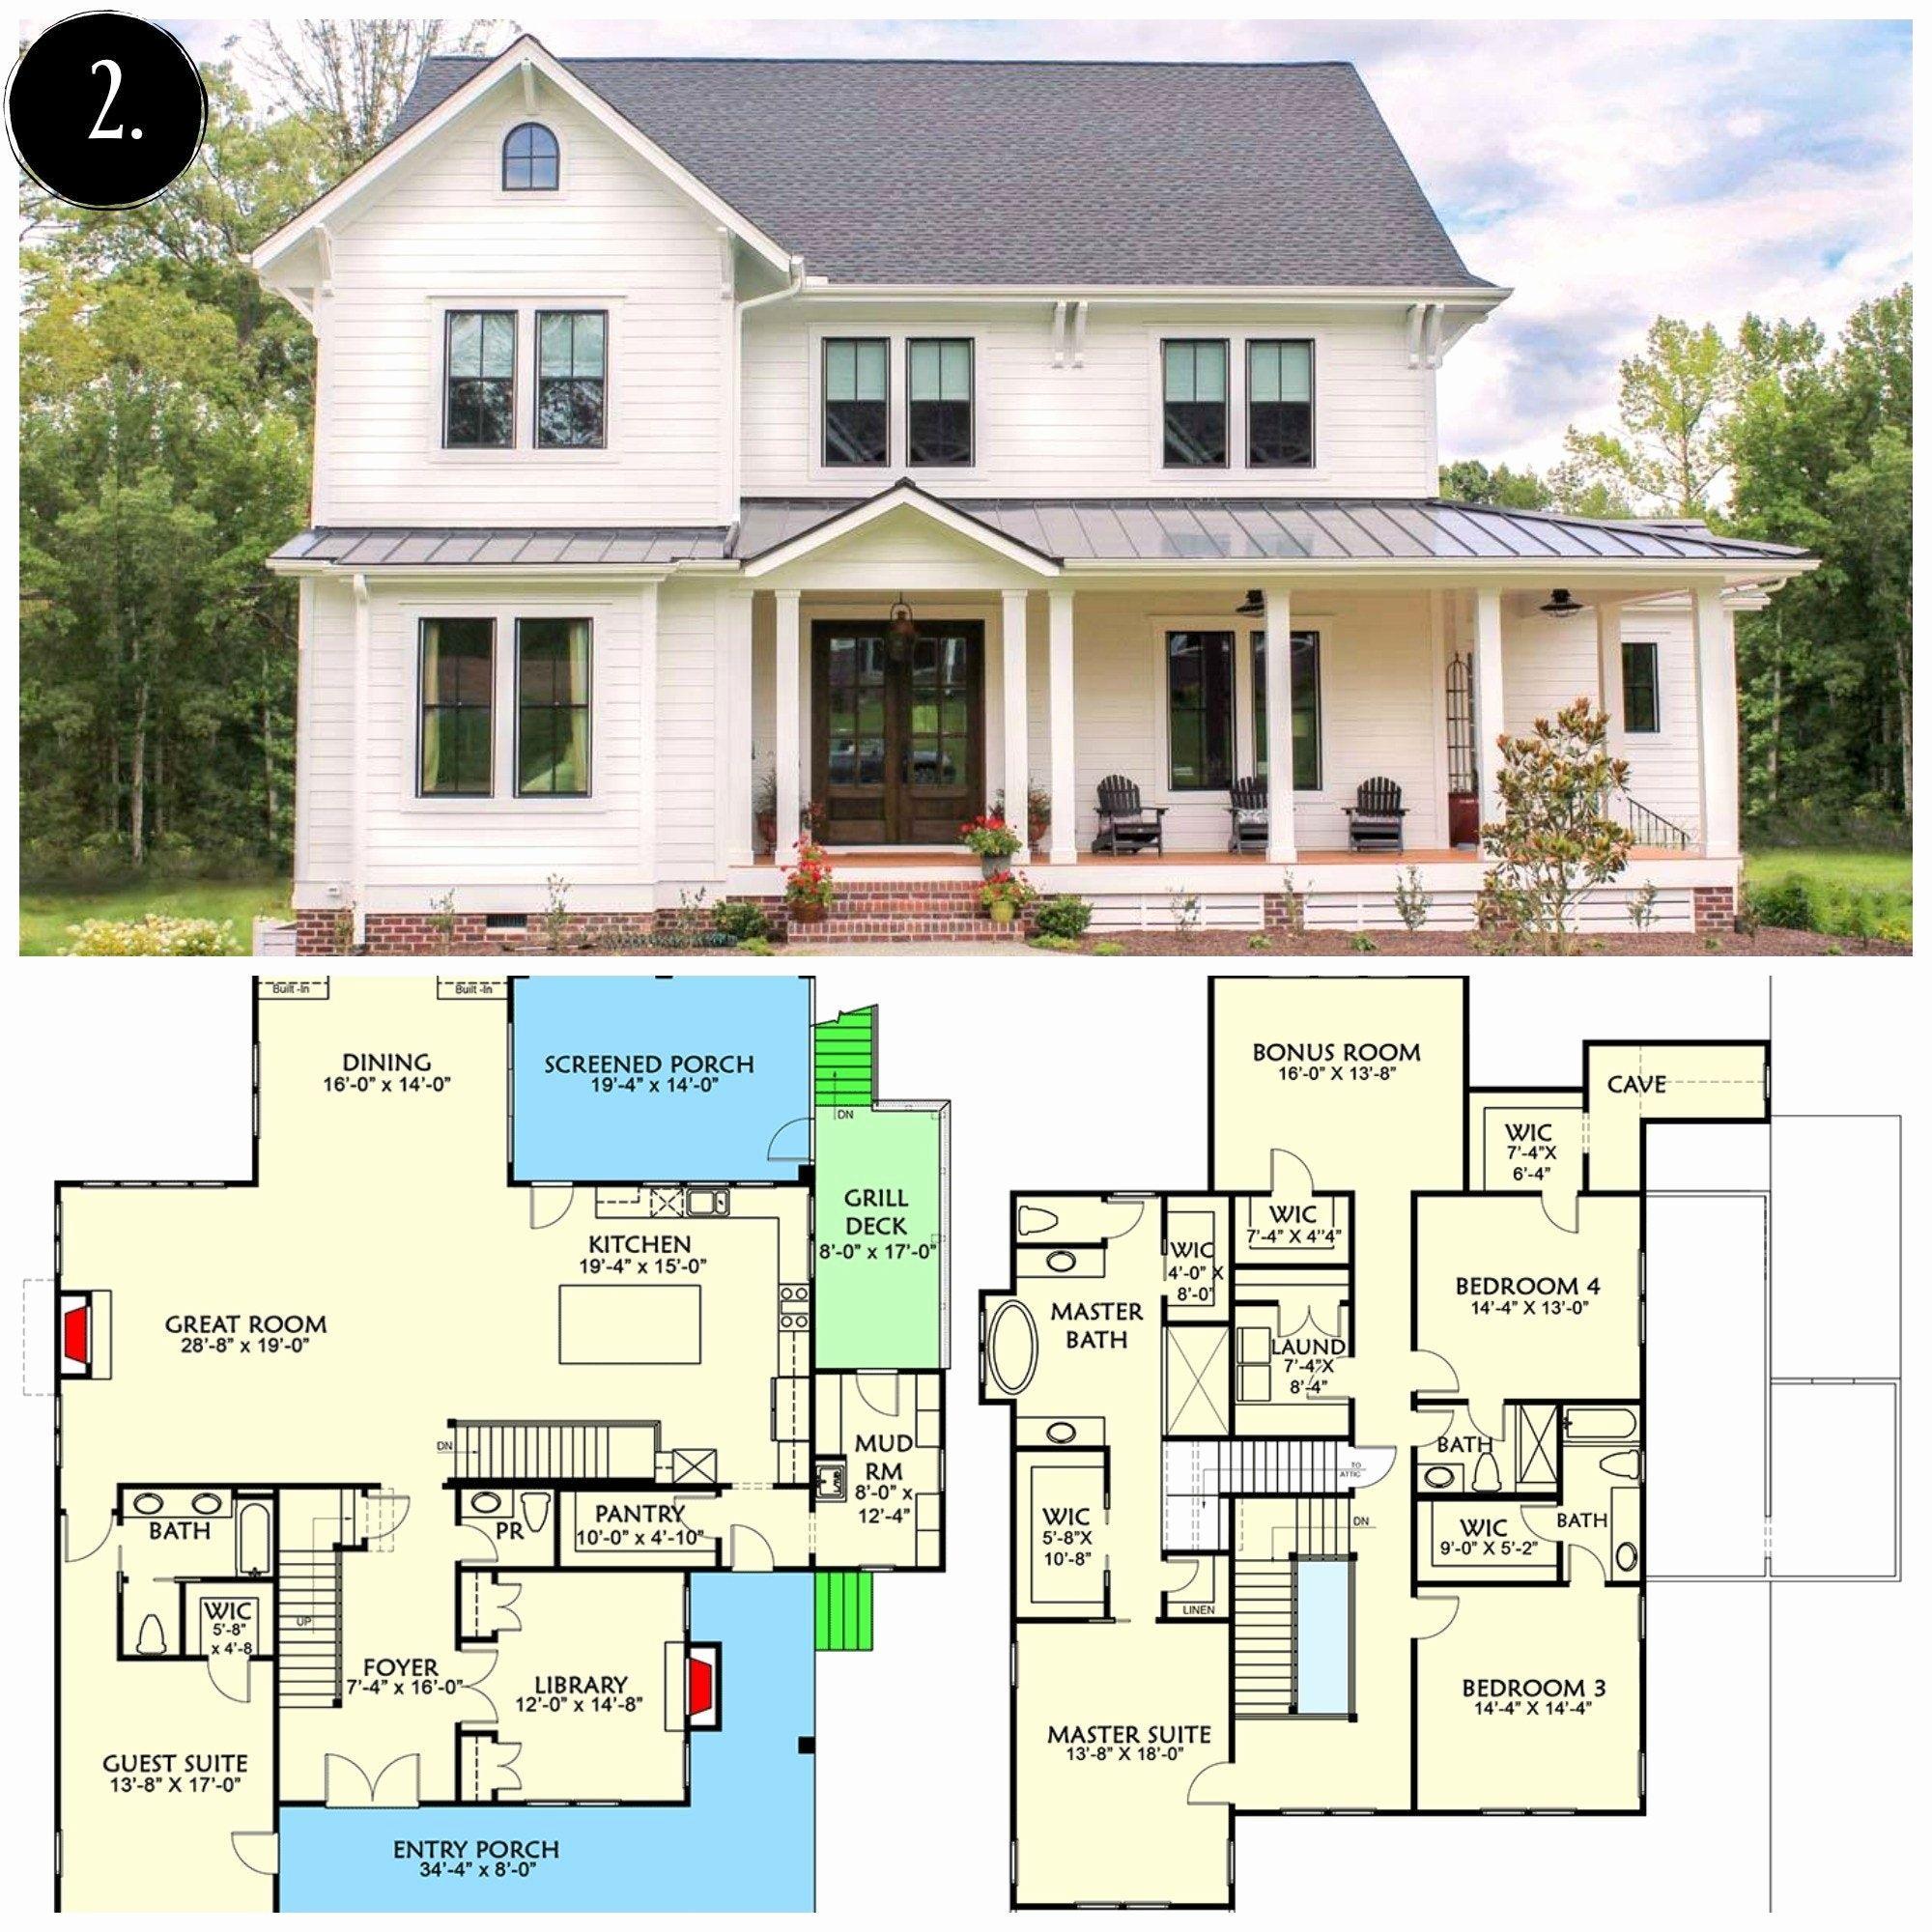 Just Found Best Farmhouse Floor Plans House Plans I Recommend This Site Best Picture Farmhouse Floor Plans Modern Farmhouse Plans Modern Farmhouse Floors